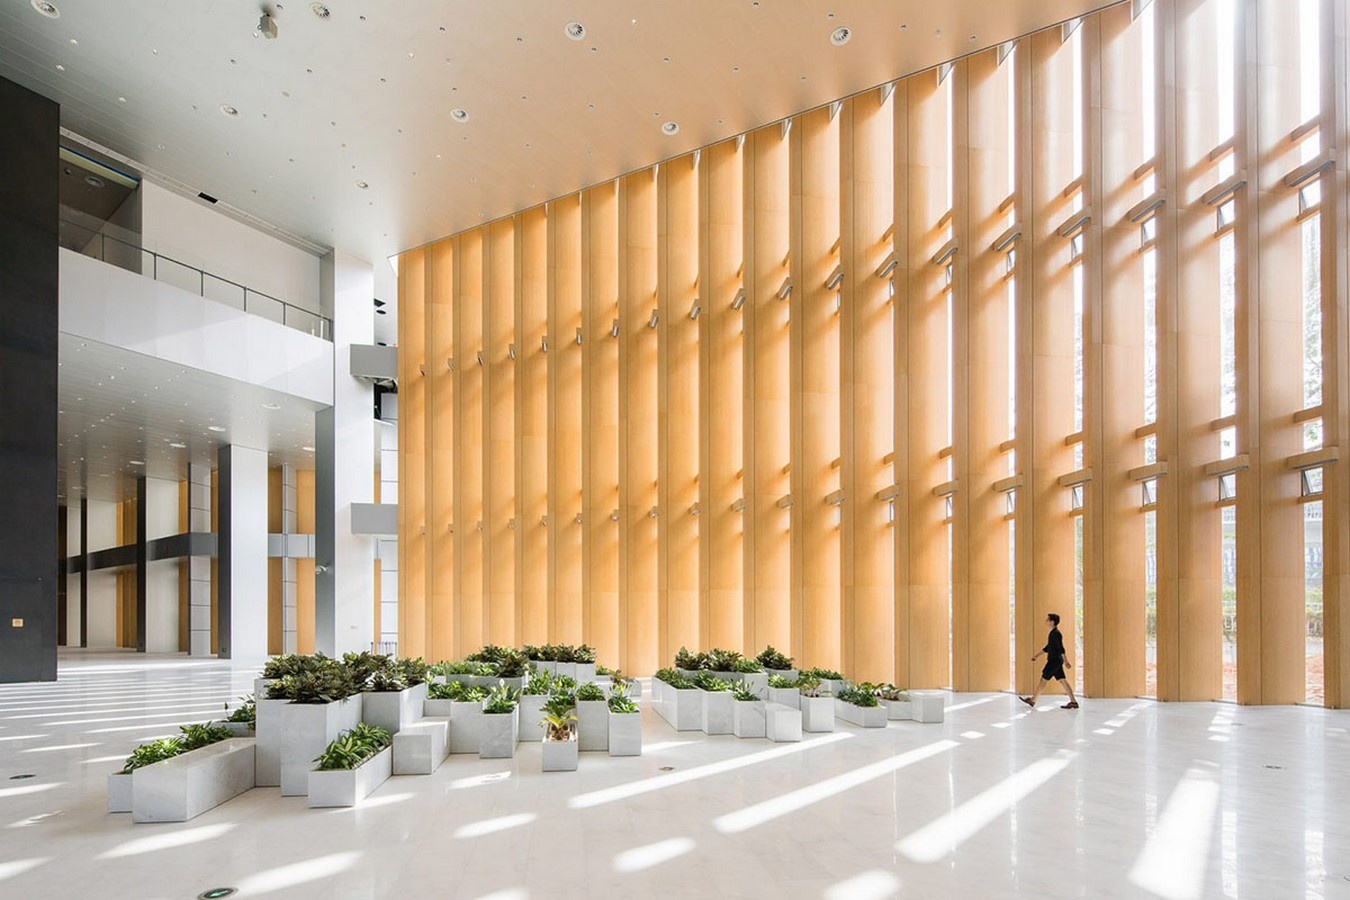 Shenzhen International Energy Mansion by BIG: The uncommon facade design - Sheet14